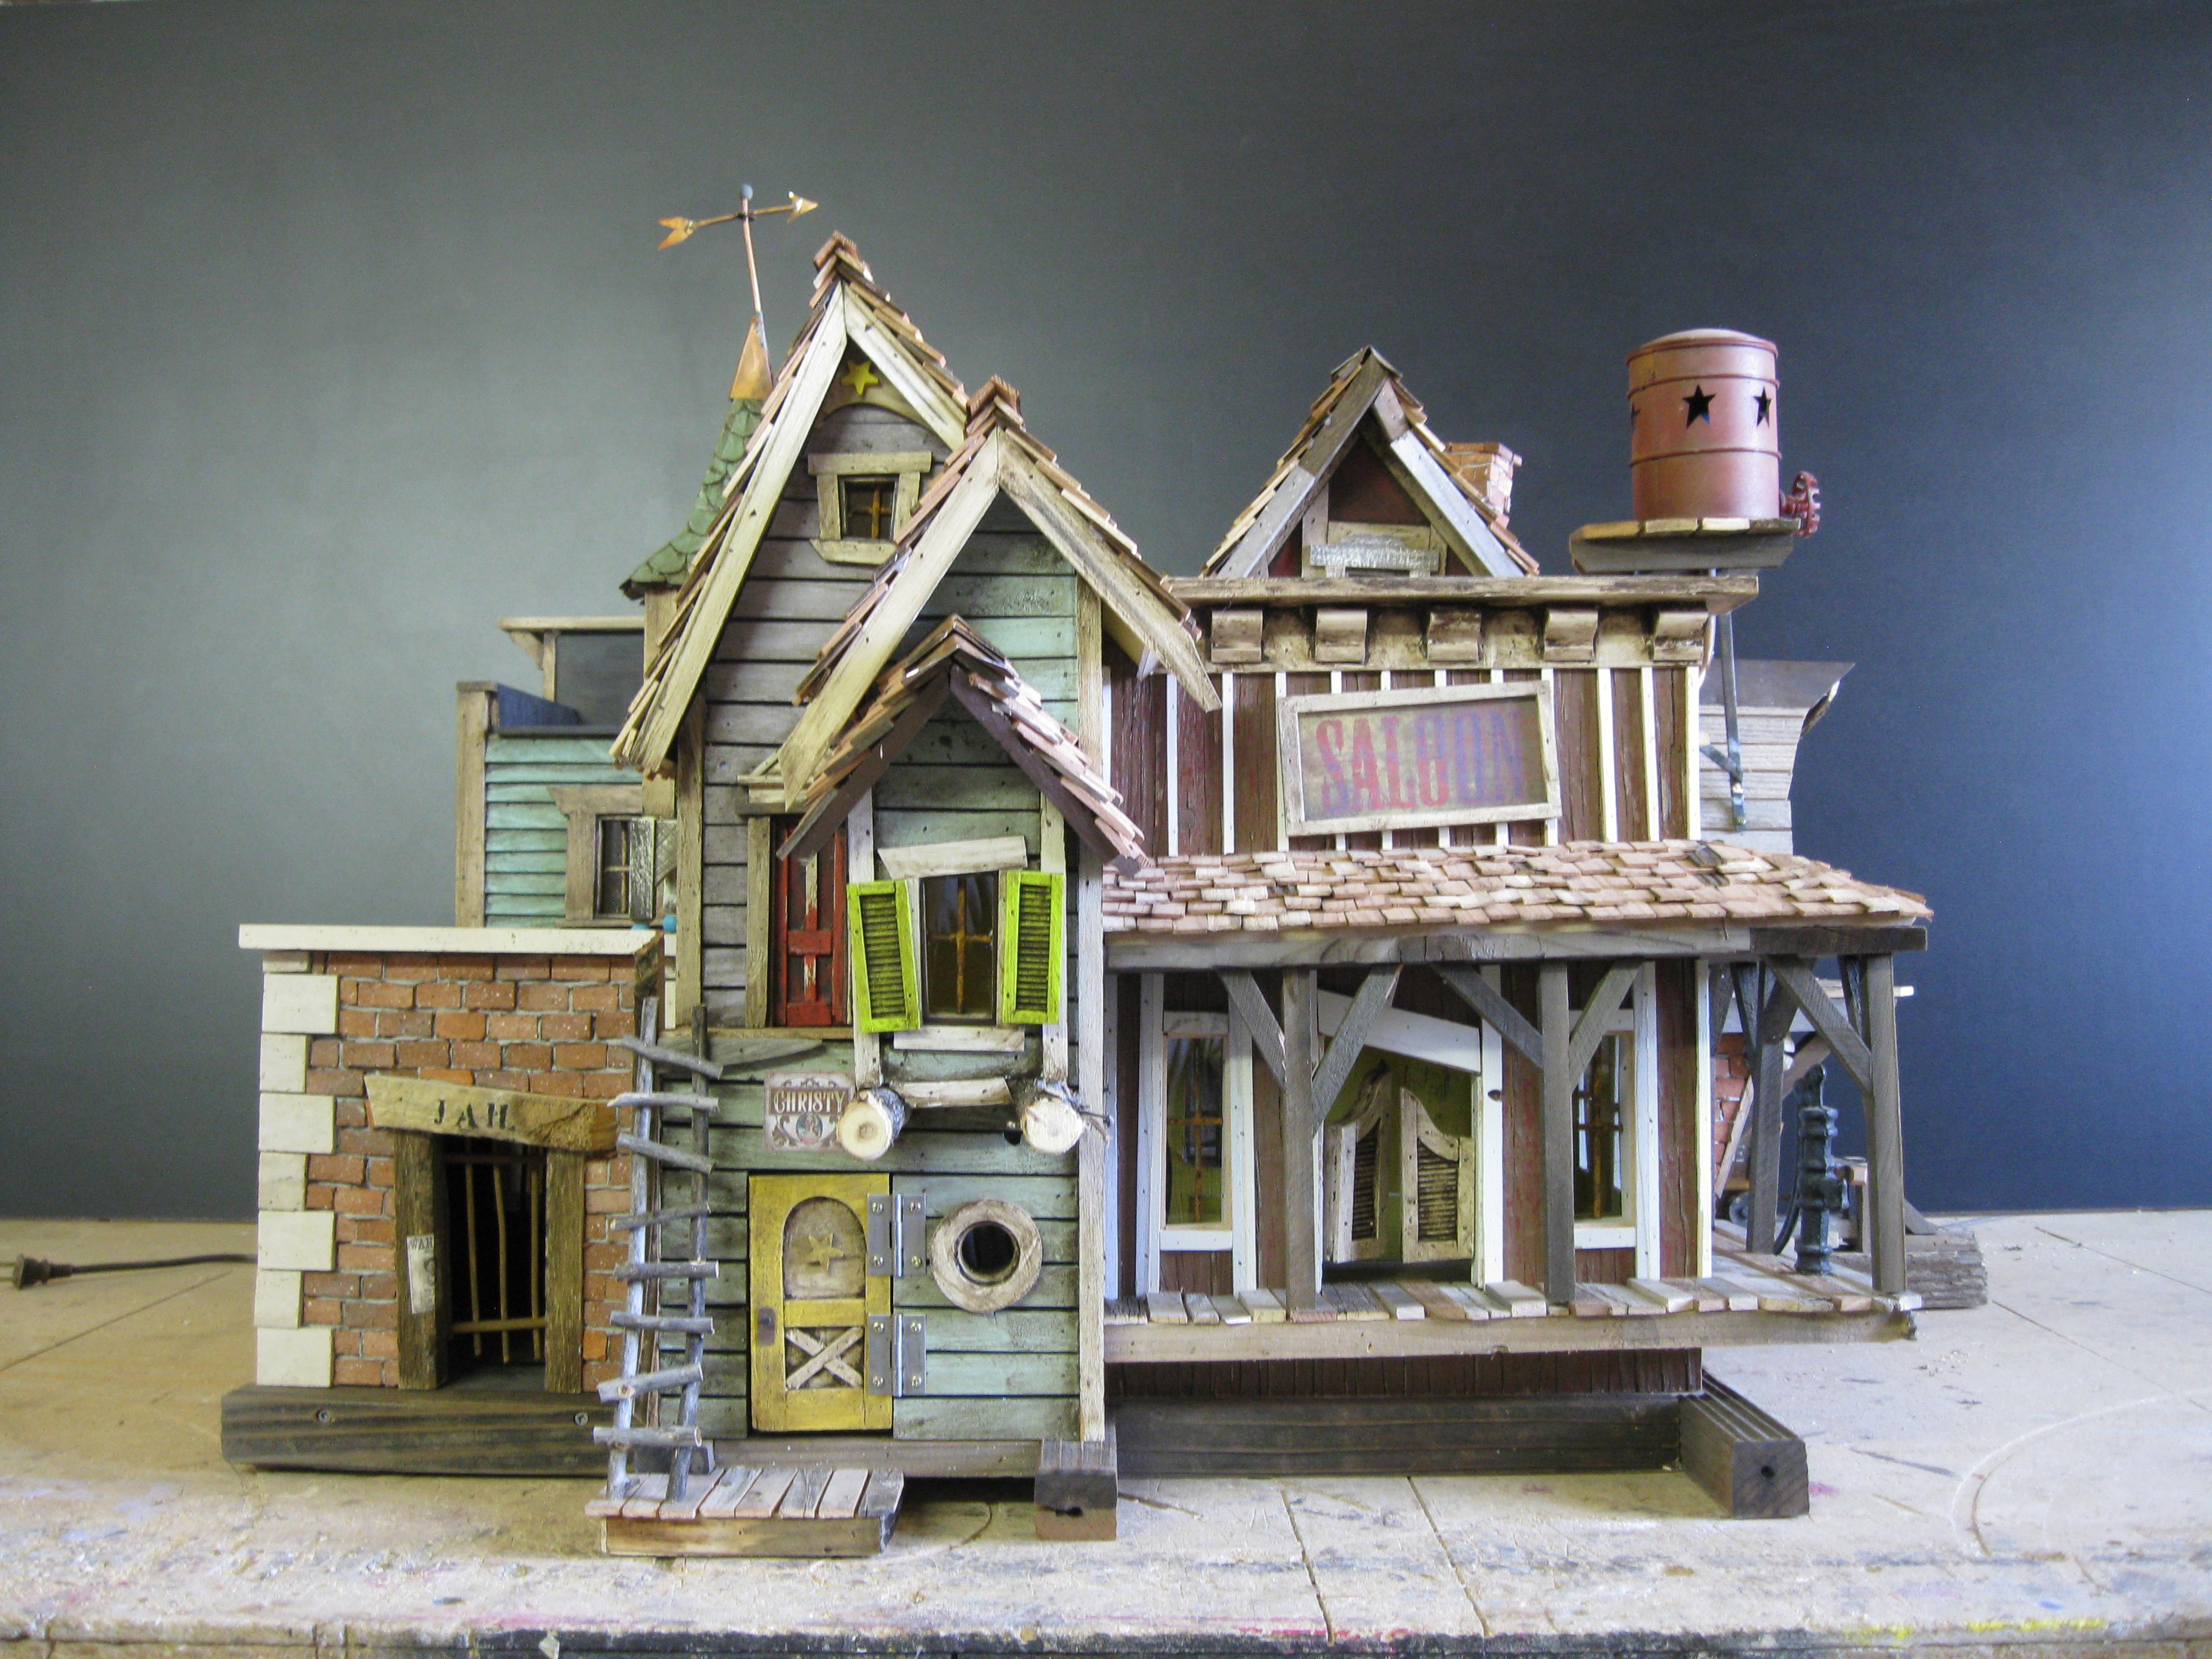 Crookedbirdhouse